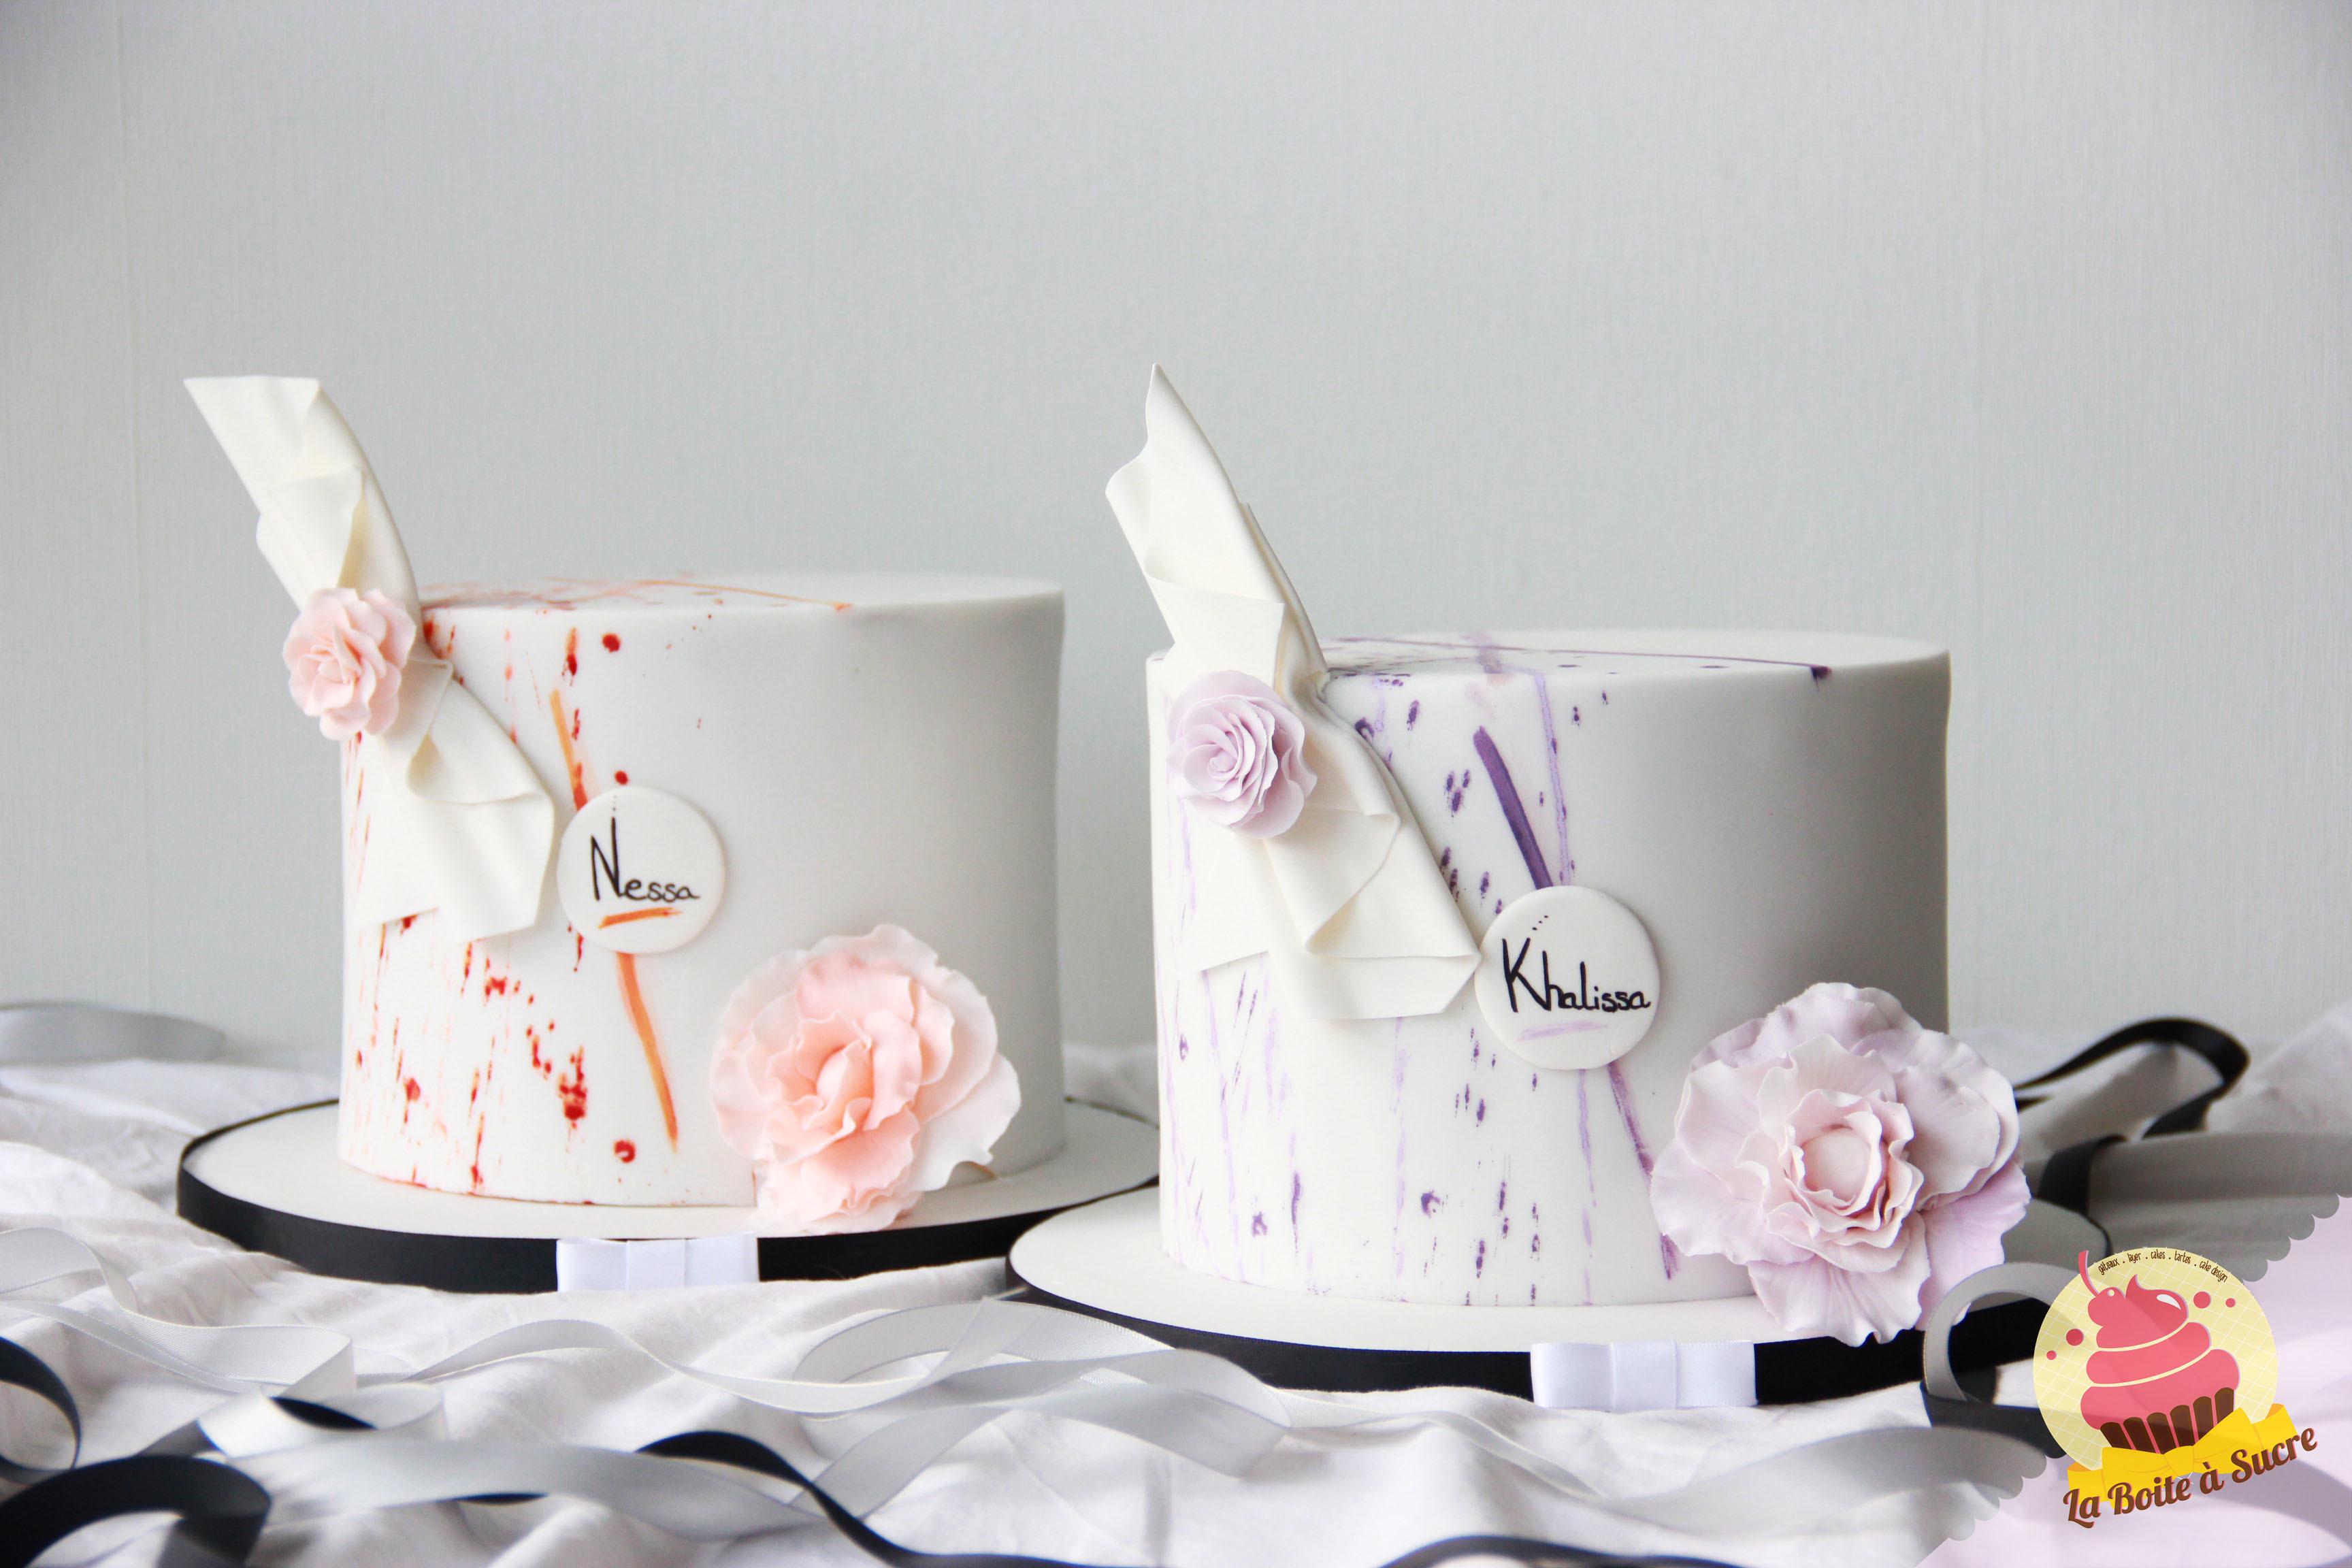 Mini White Splatter Paint Cakes